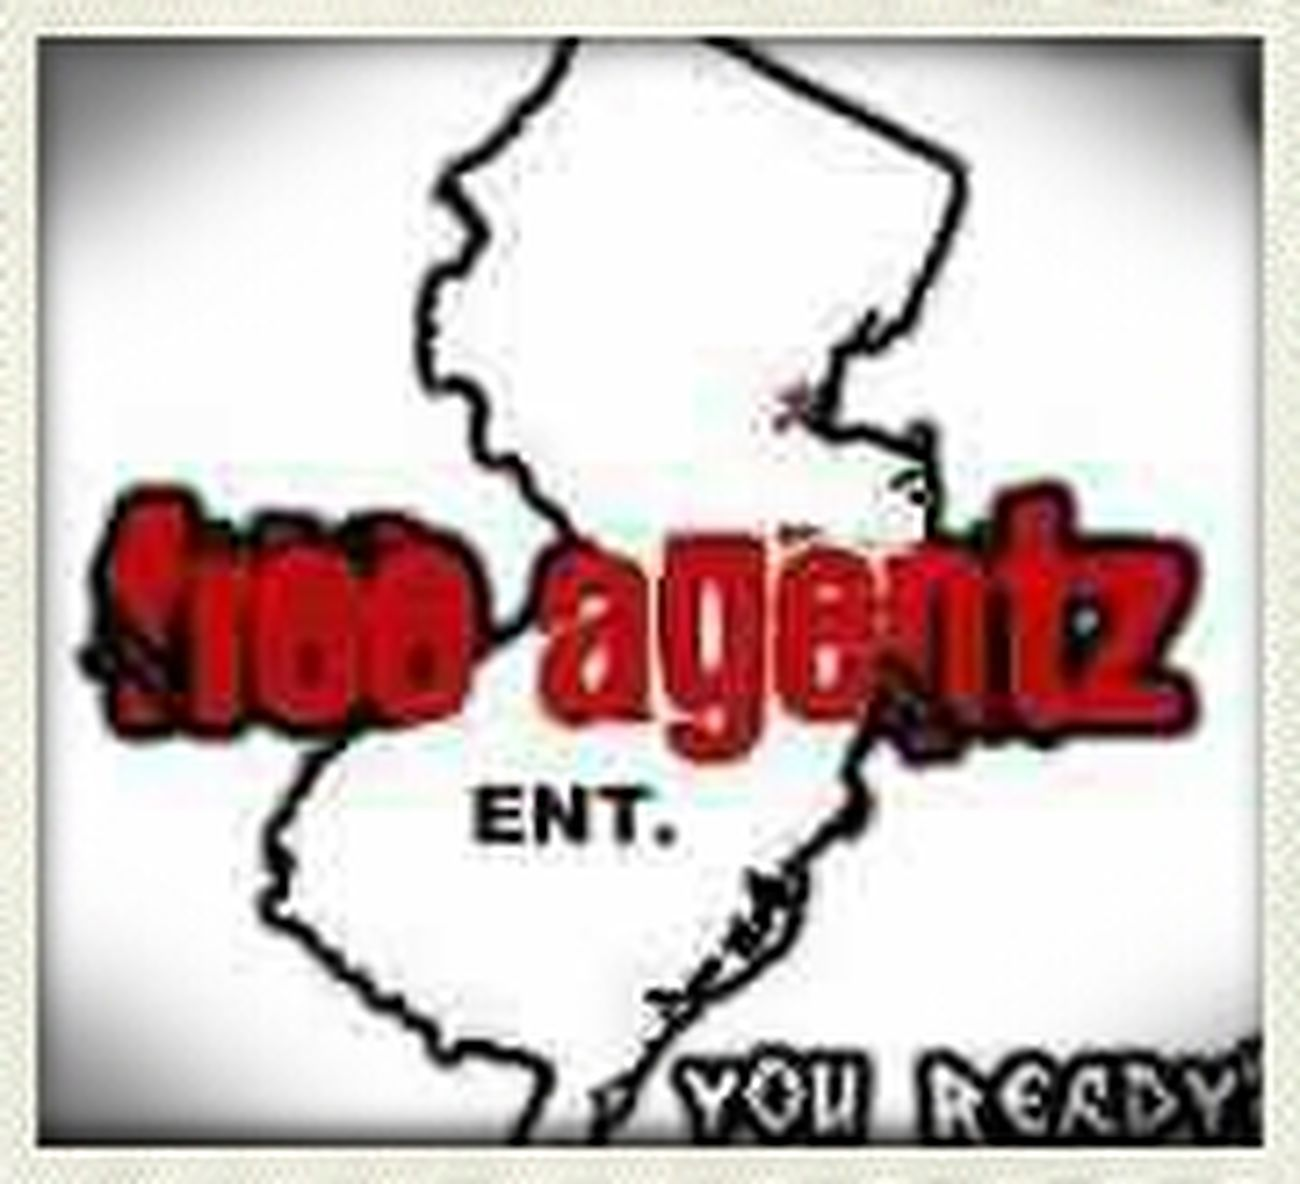 FreeAgentzEnt